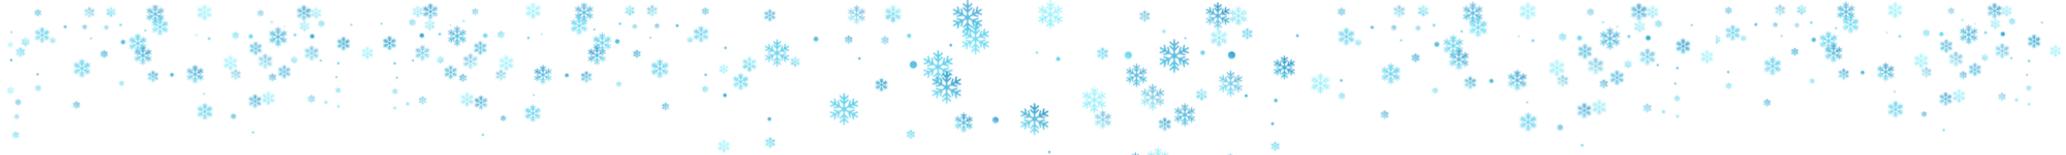 Snowflake Header.png